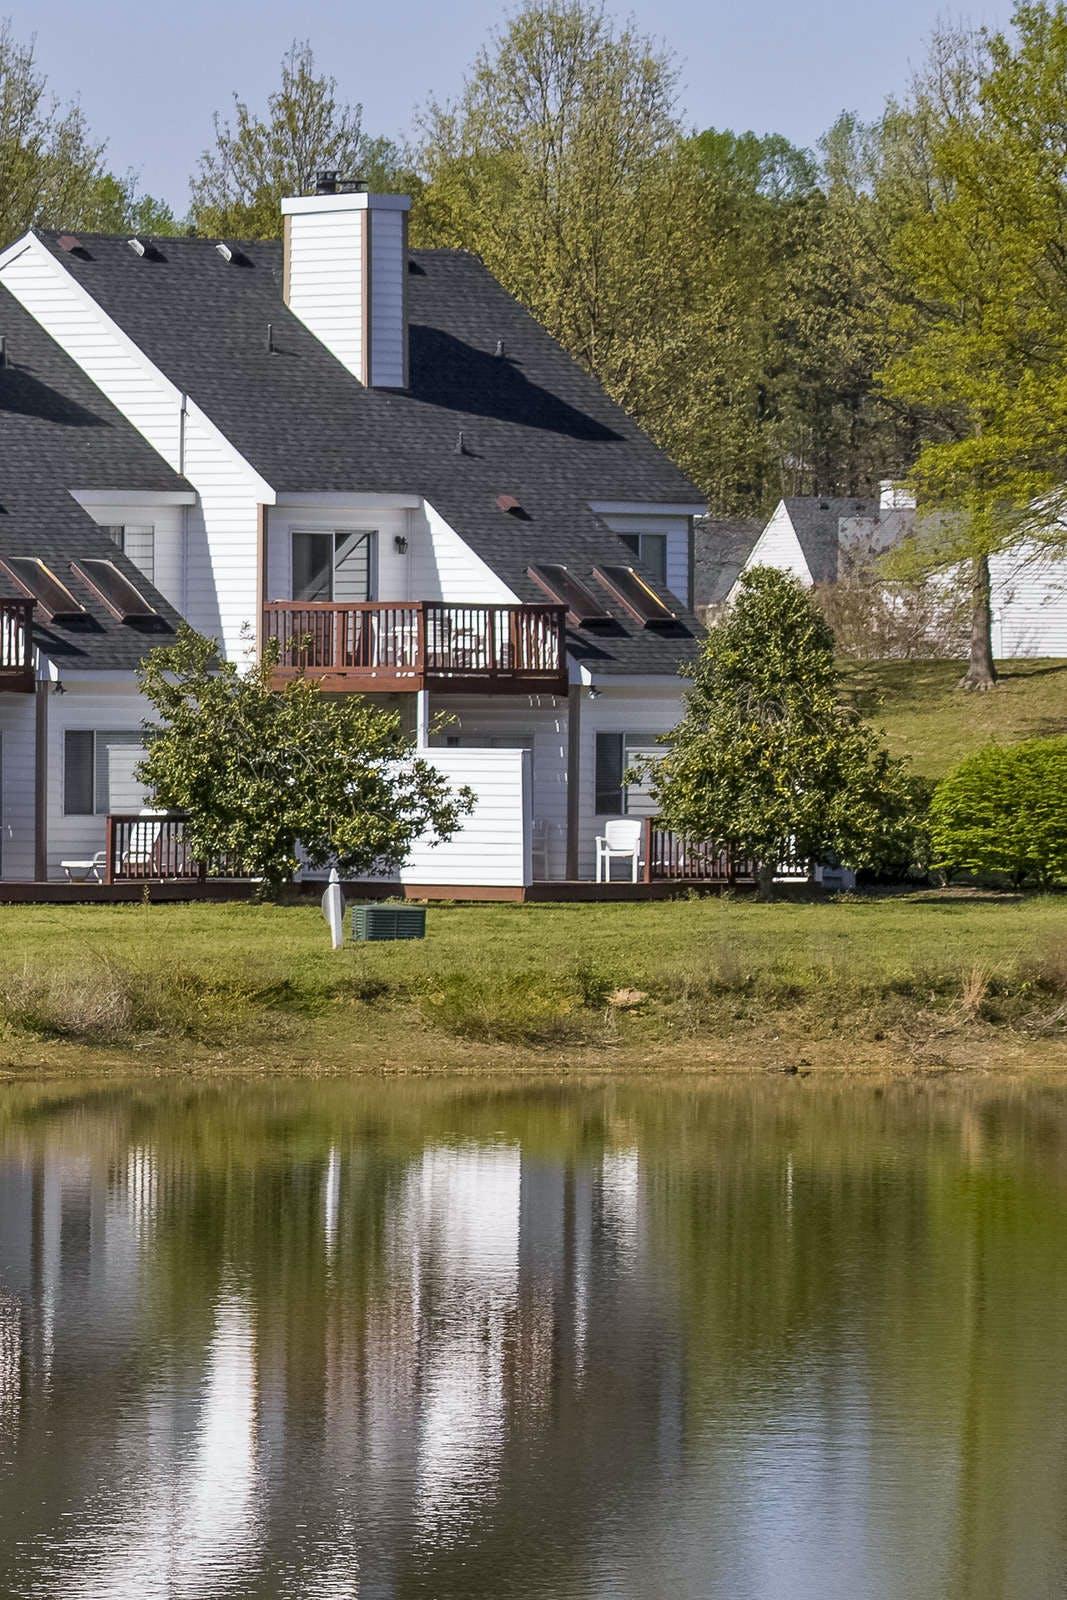 The Historic Powhatan Resort